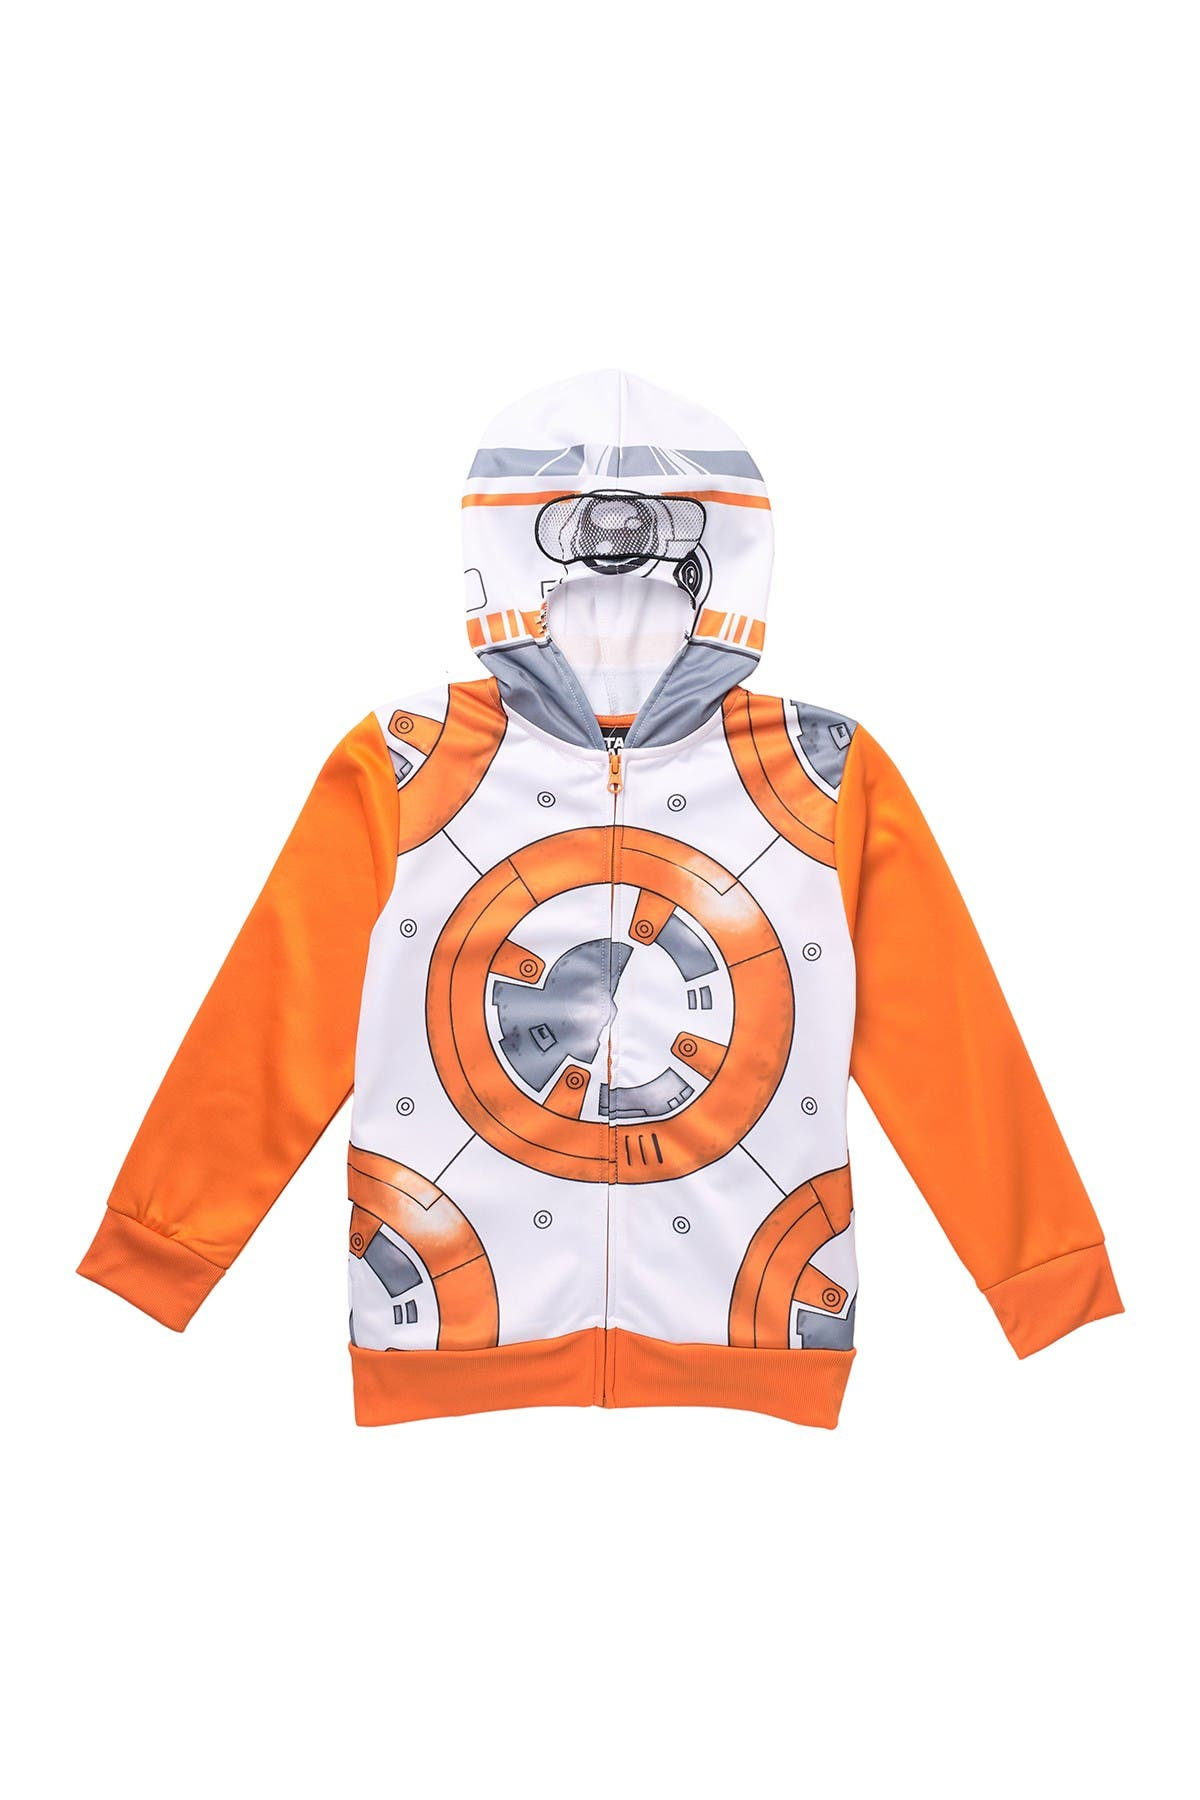 Image of JEM BB-8 Costume Hoodie